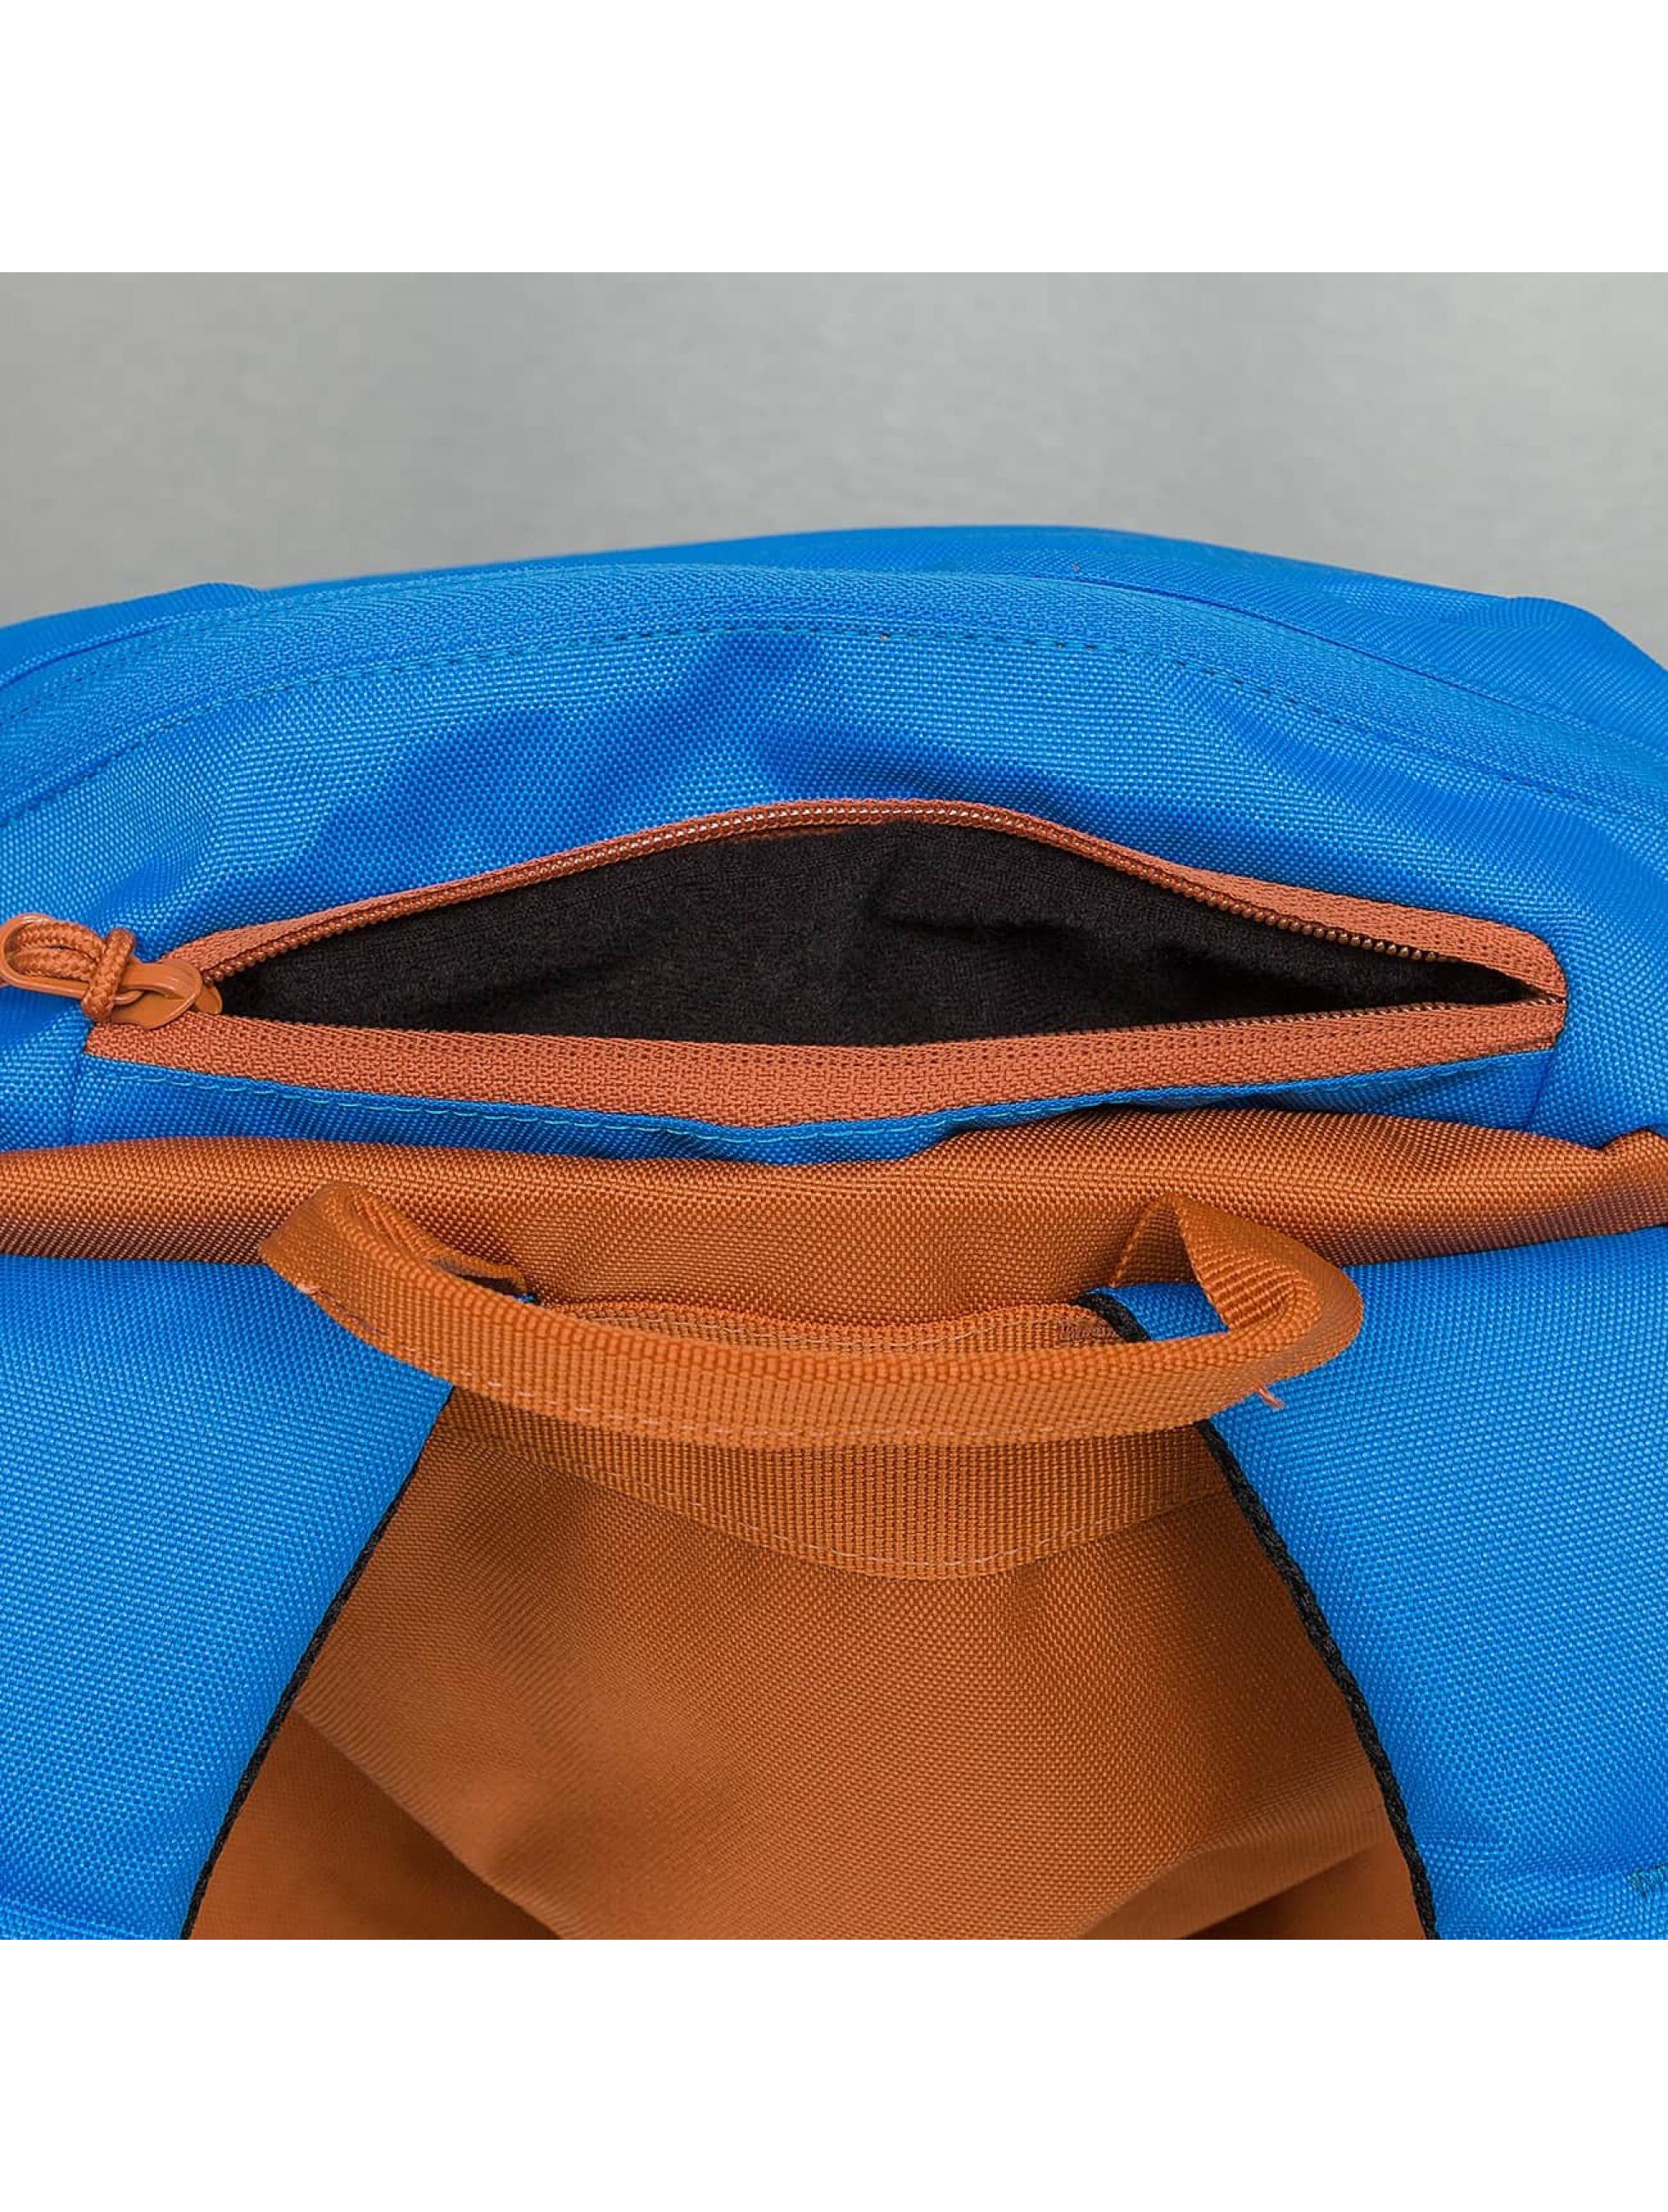 Electric Batohy MARSHAL modrá